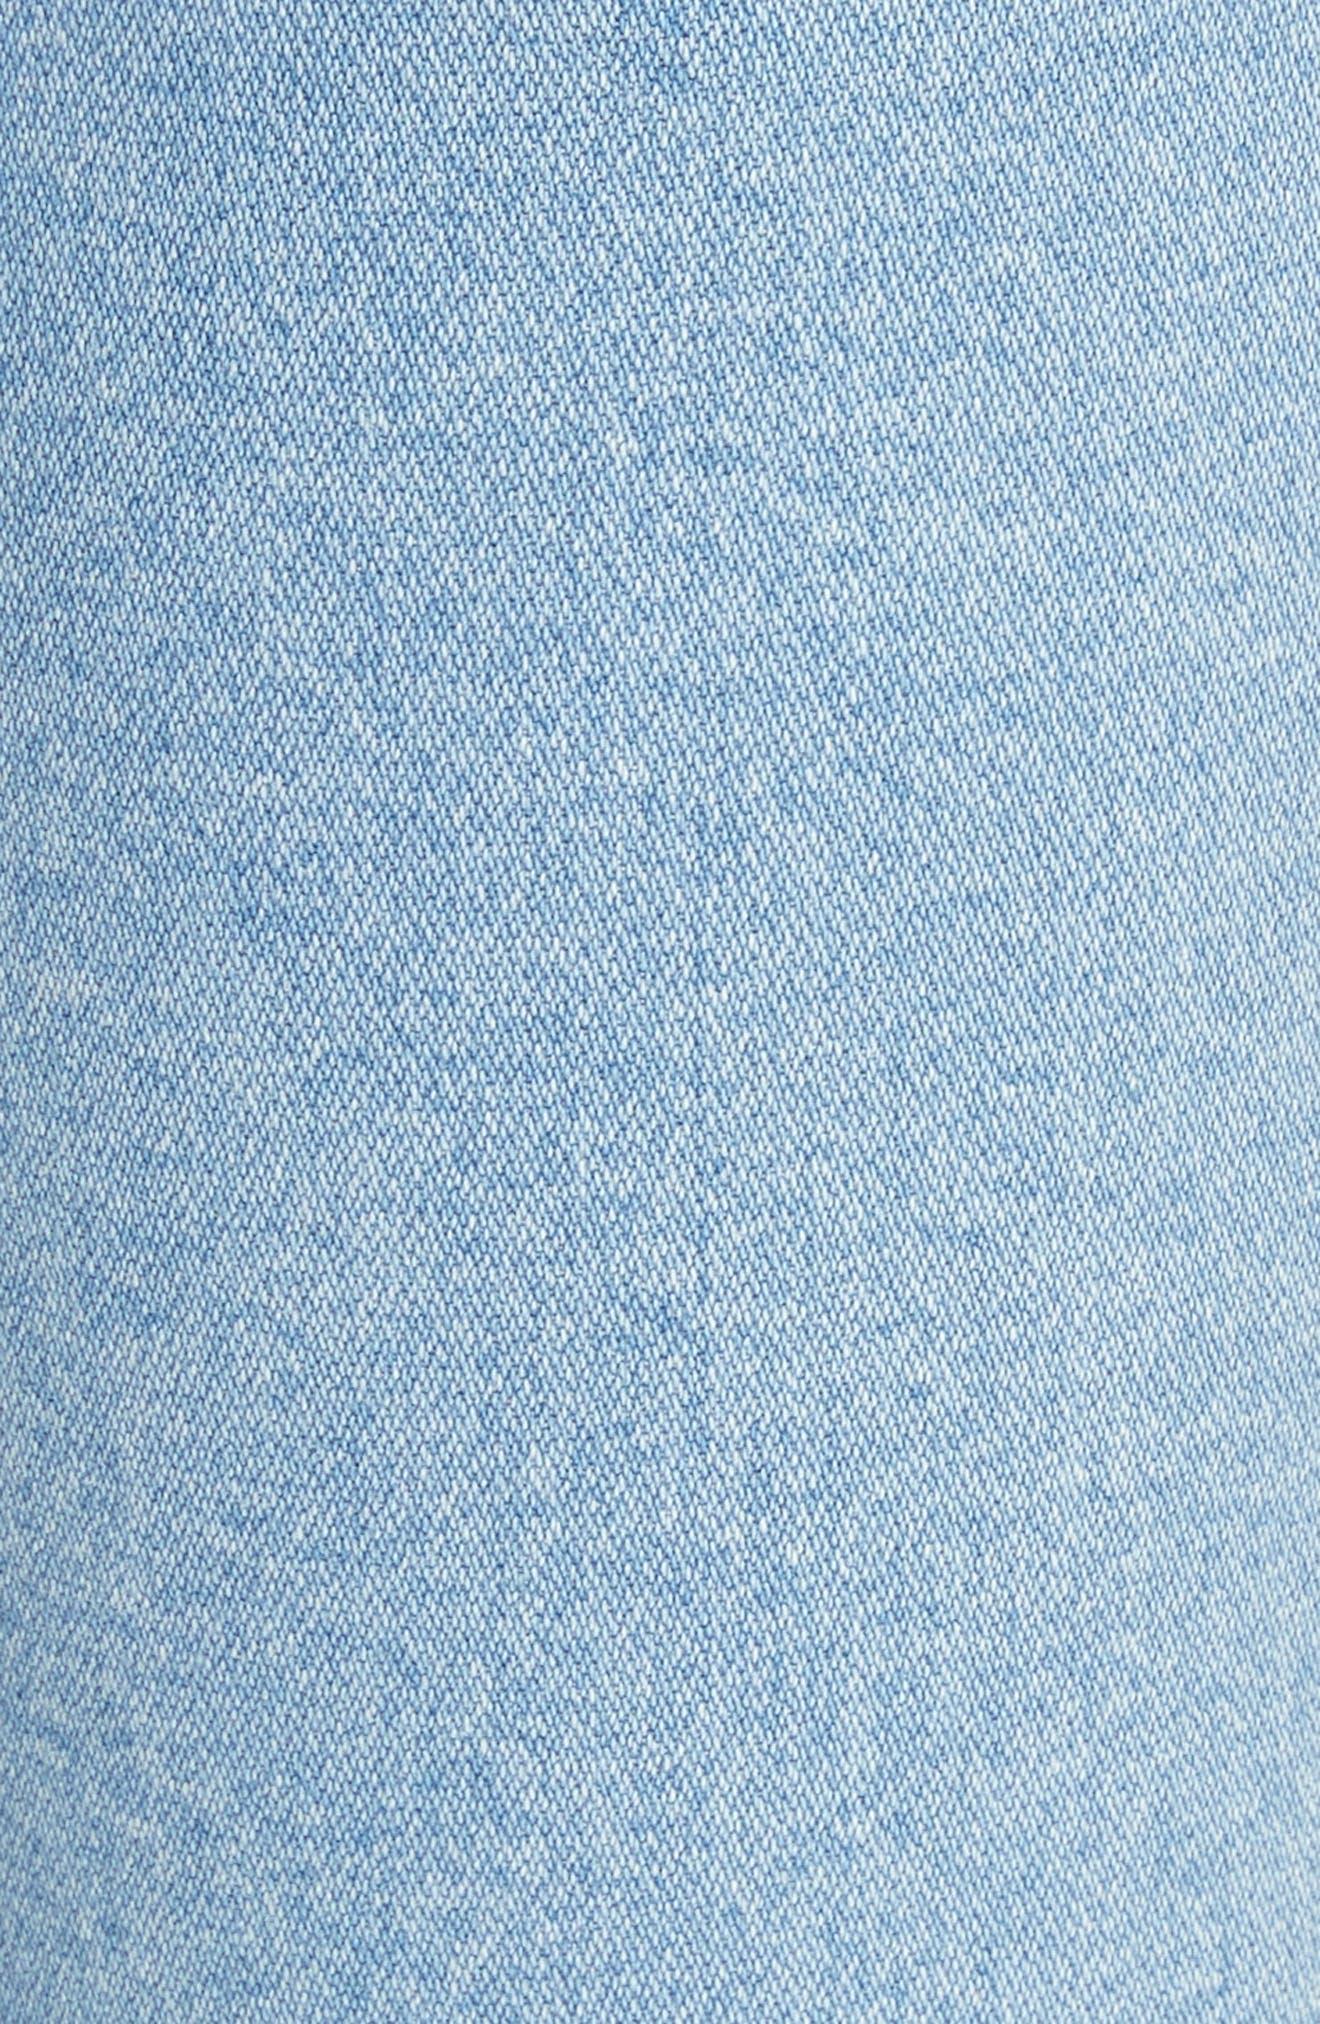 Justine High Waist Wide Leg Trouser Jeans,                             Alternate thumbnail 5, color,                             Broken Nelly